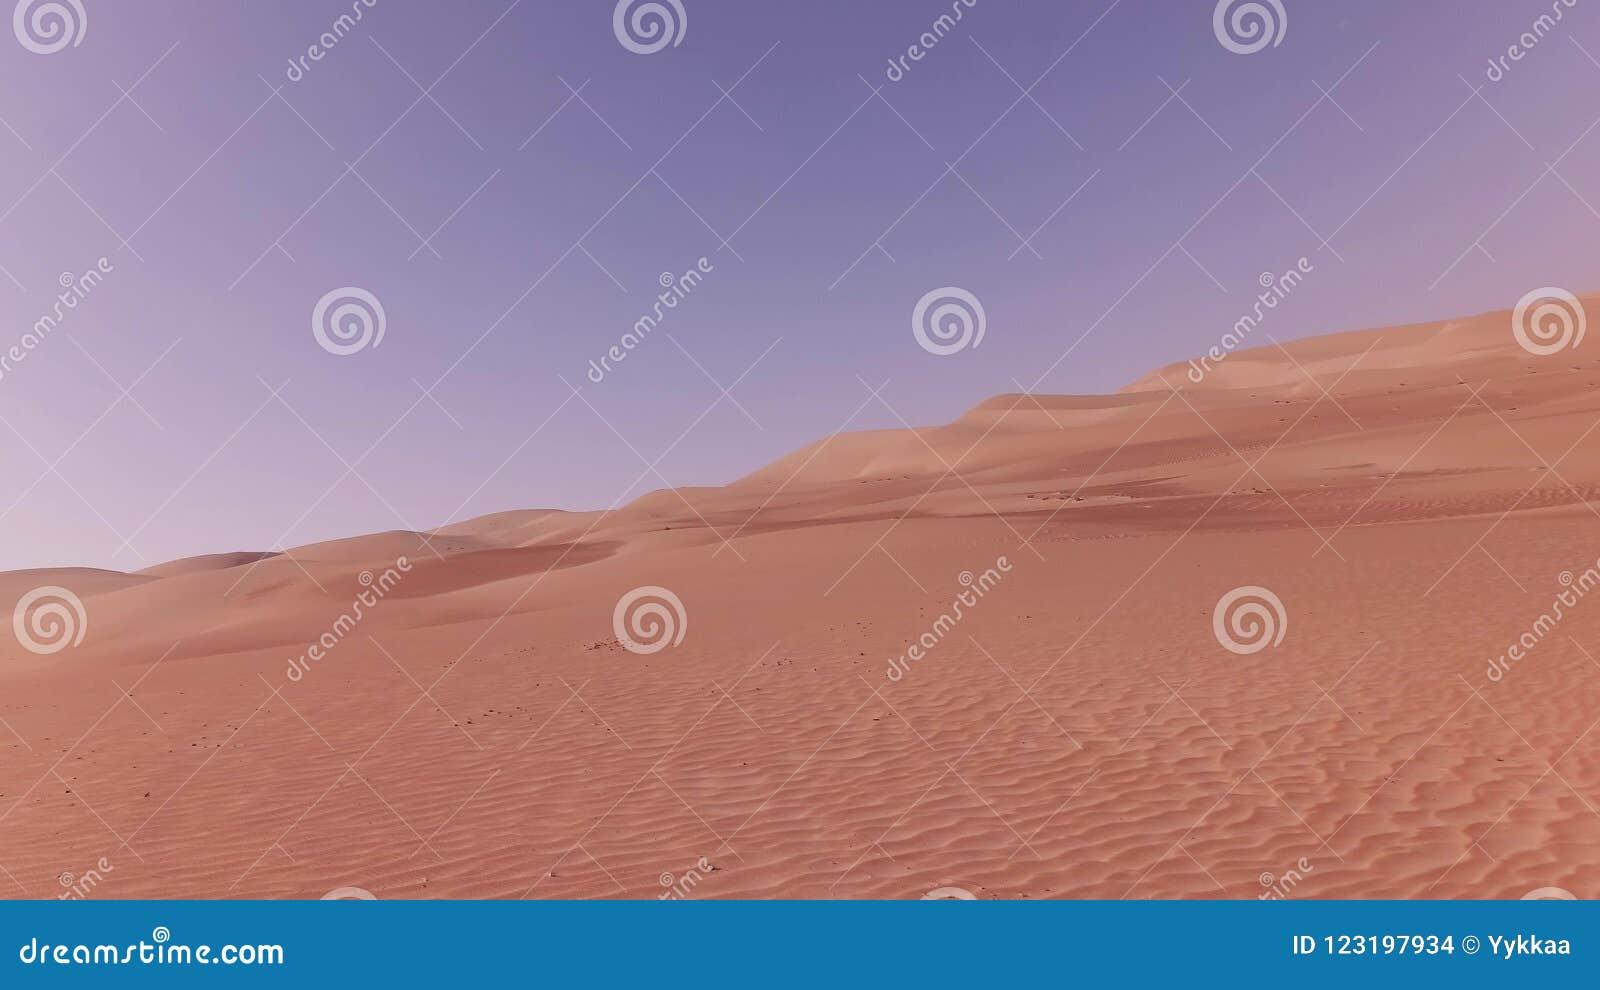 traveling on an off road car on the sand of rub al khali desert